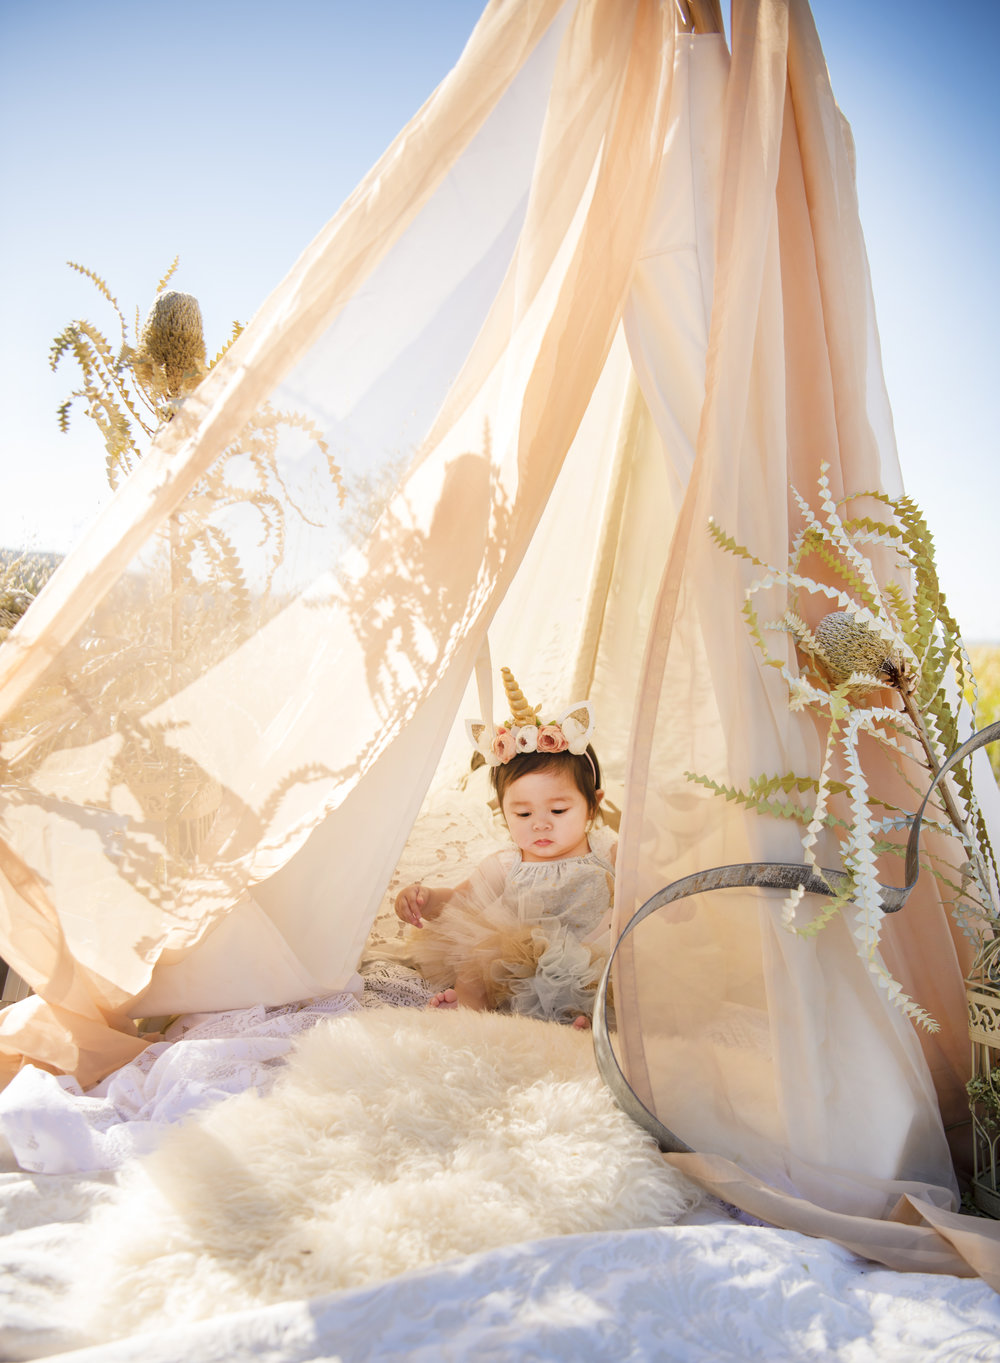 FINAL_Lets_Spread_Beauty_Photography_Landon_Newborn20150908_0036.jpg